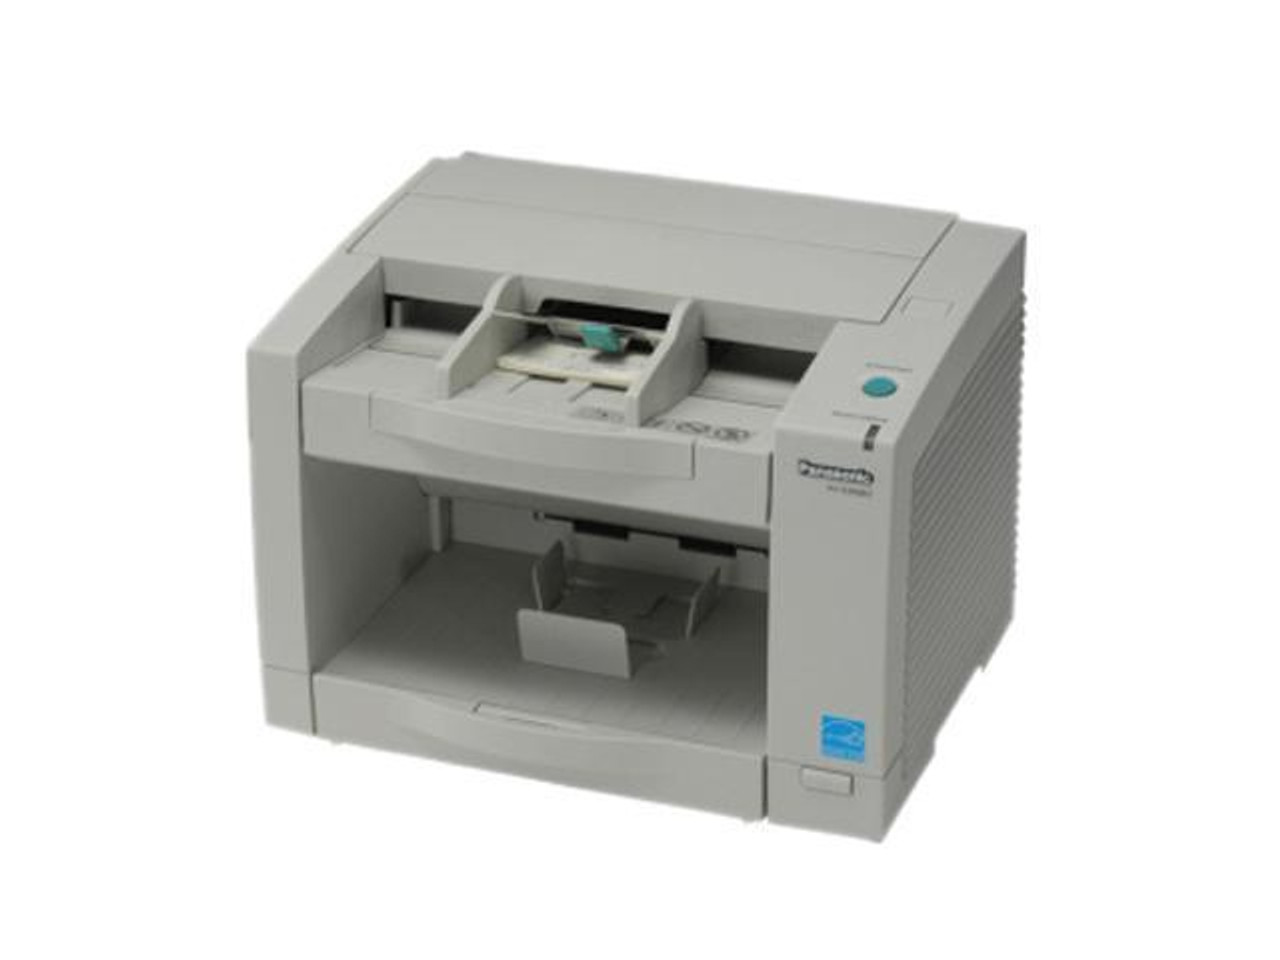 Panasonic KV-S2028C Document Scanner